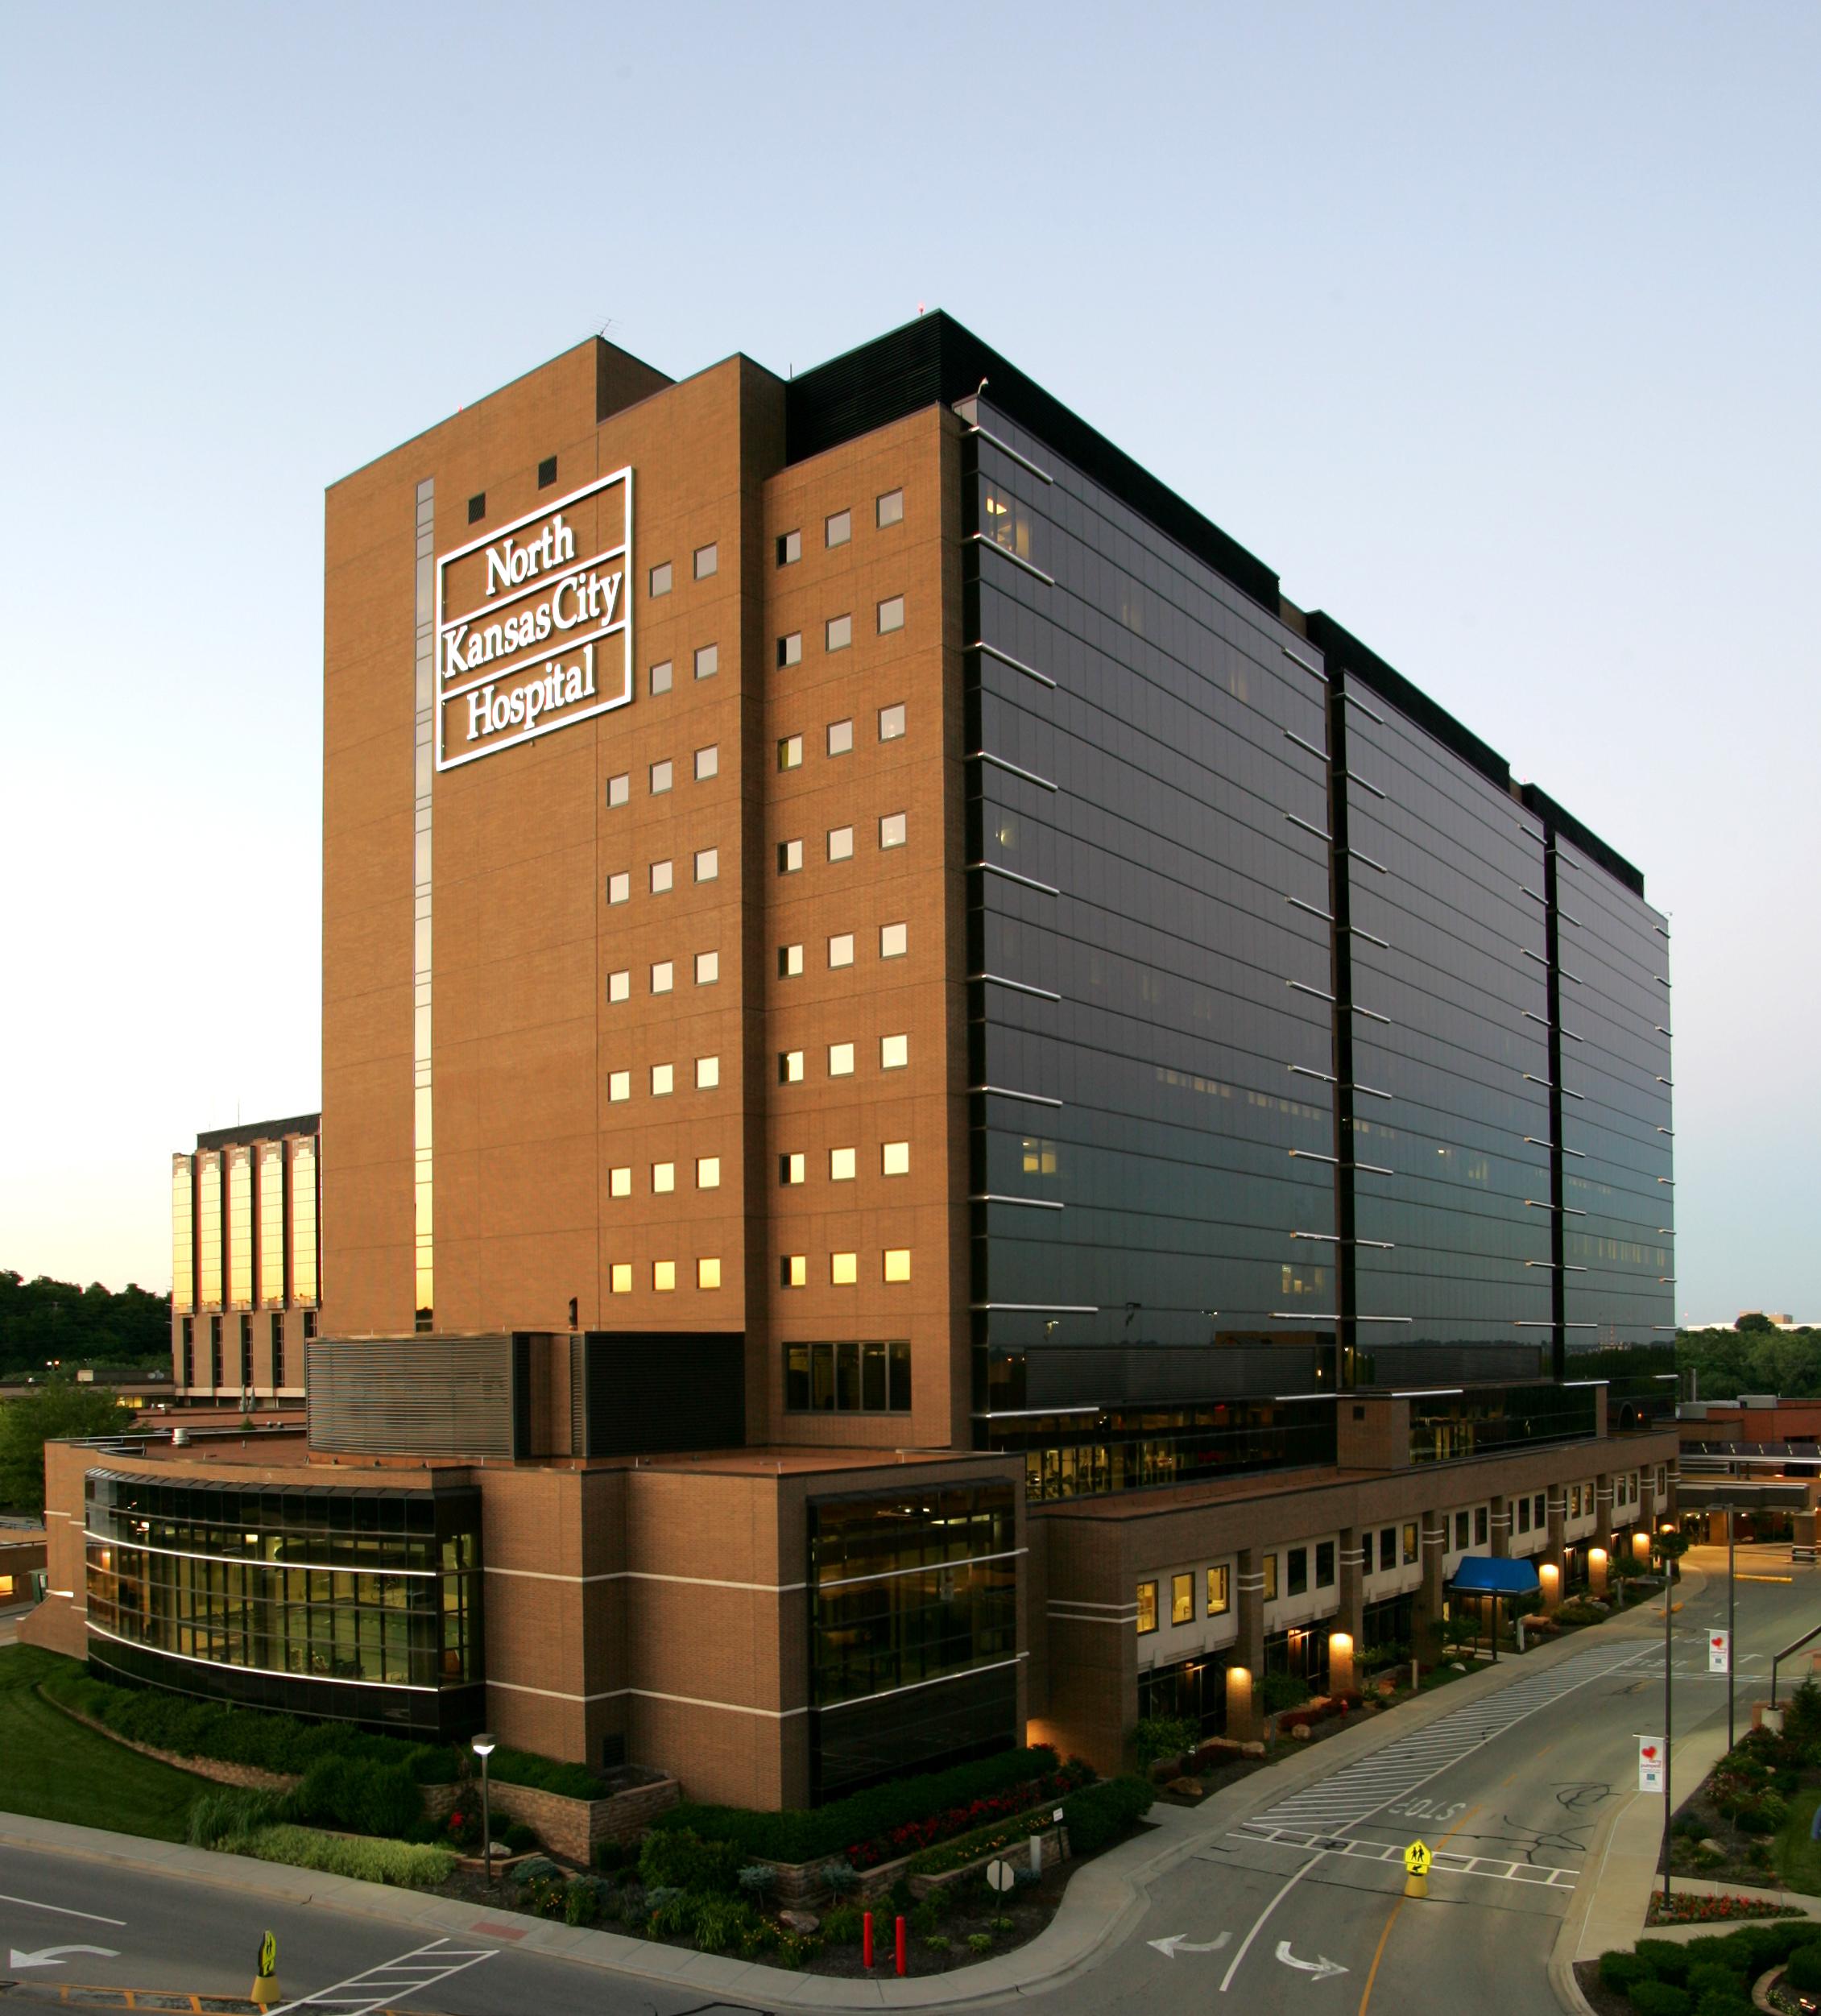 Campus Photos, North Kansas City Hospital, North Kansas ...